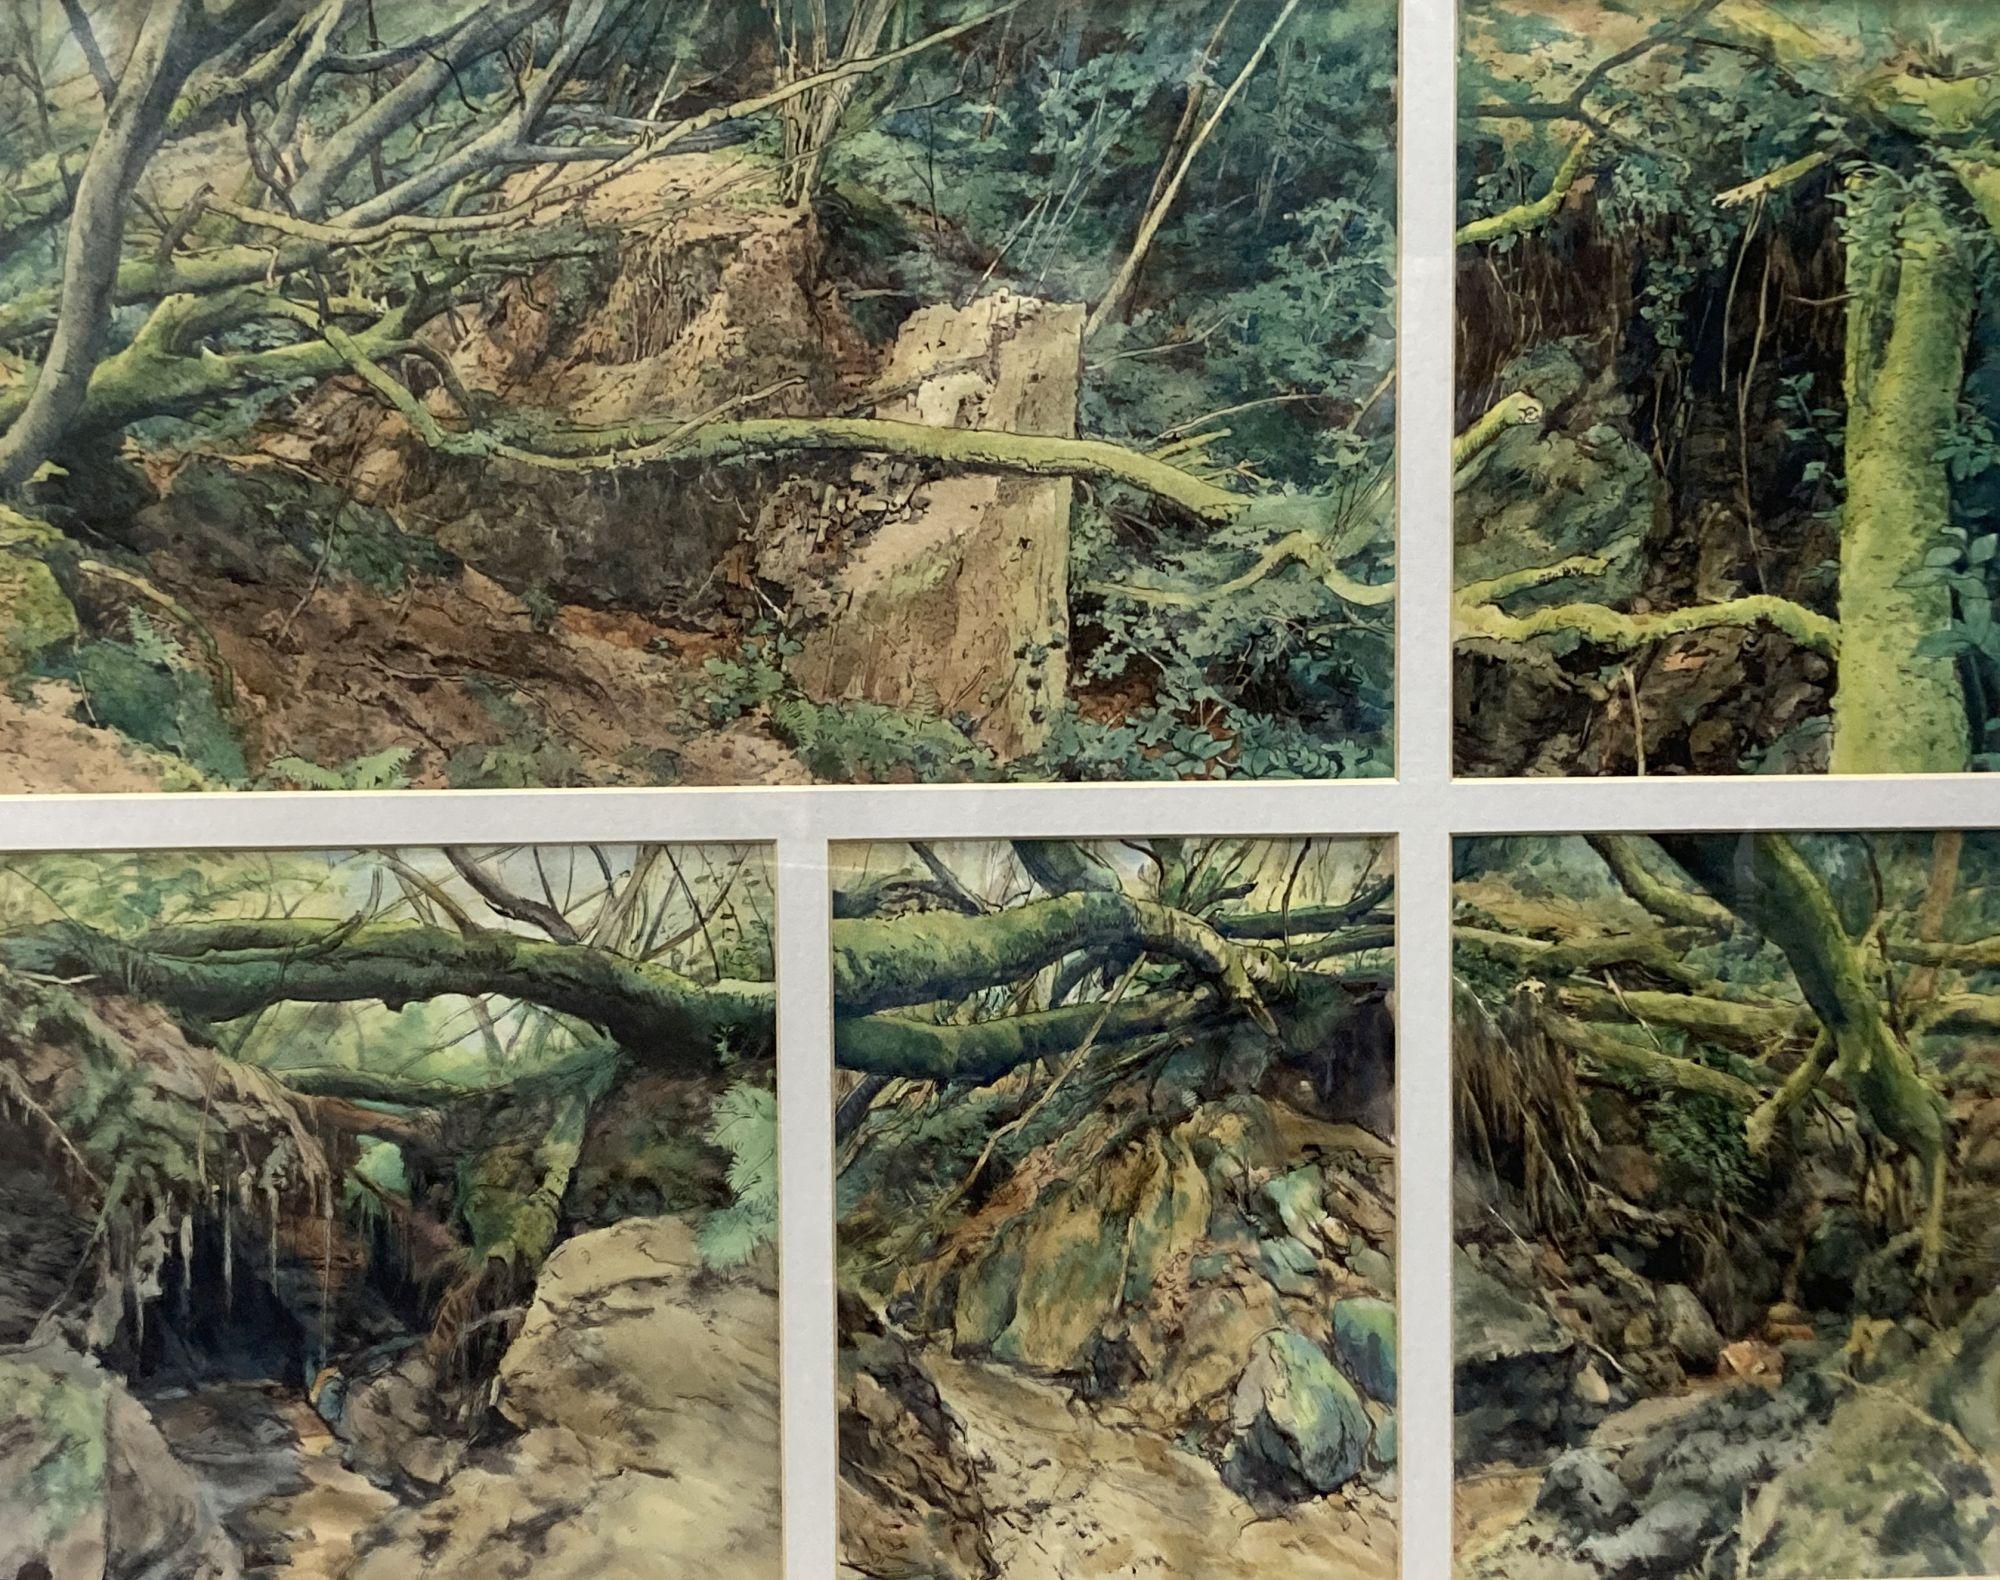 John Wiltshire (1969-), watercolour, 5 studies of the Tank Bridge, Bankside Gallery label verso,